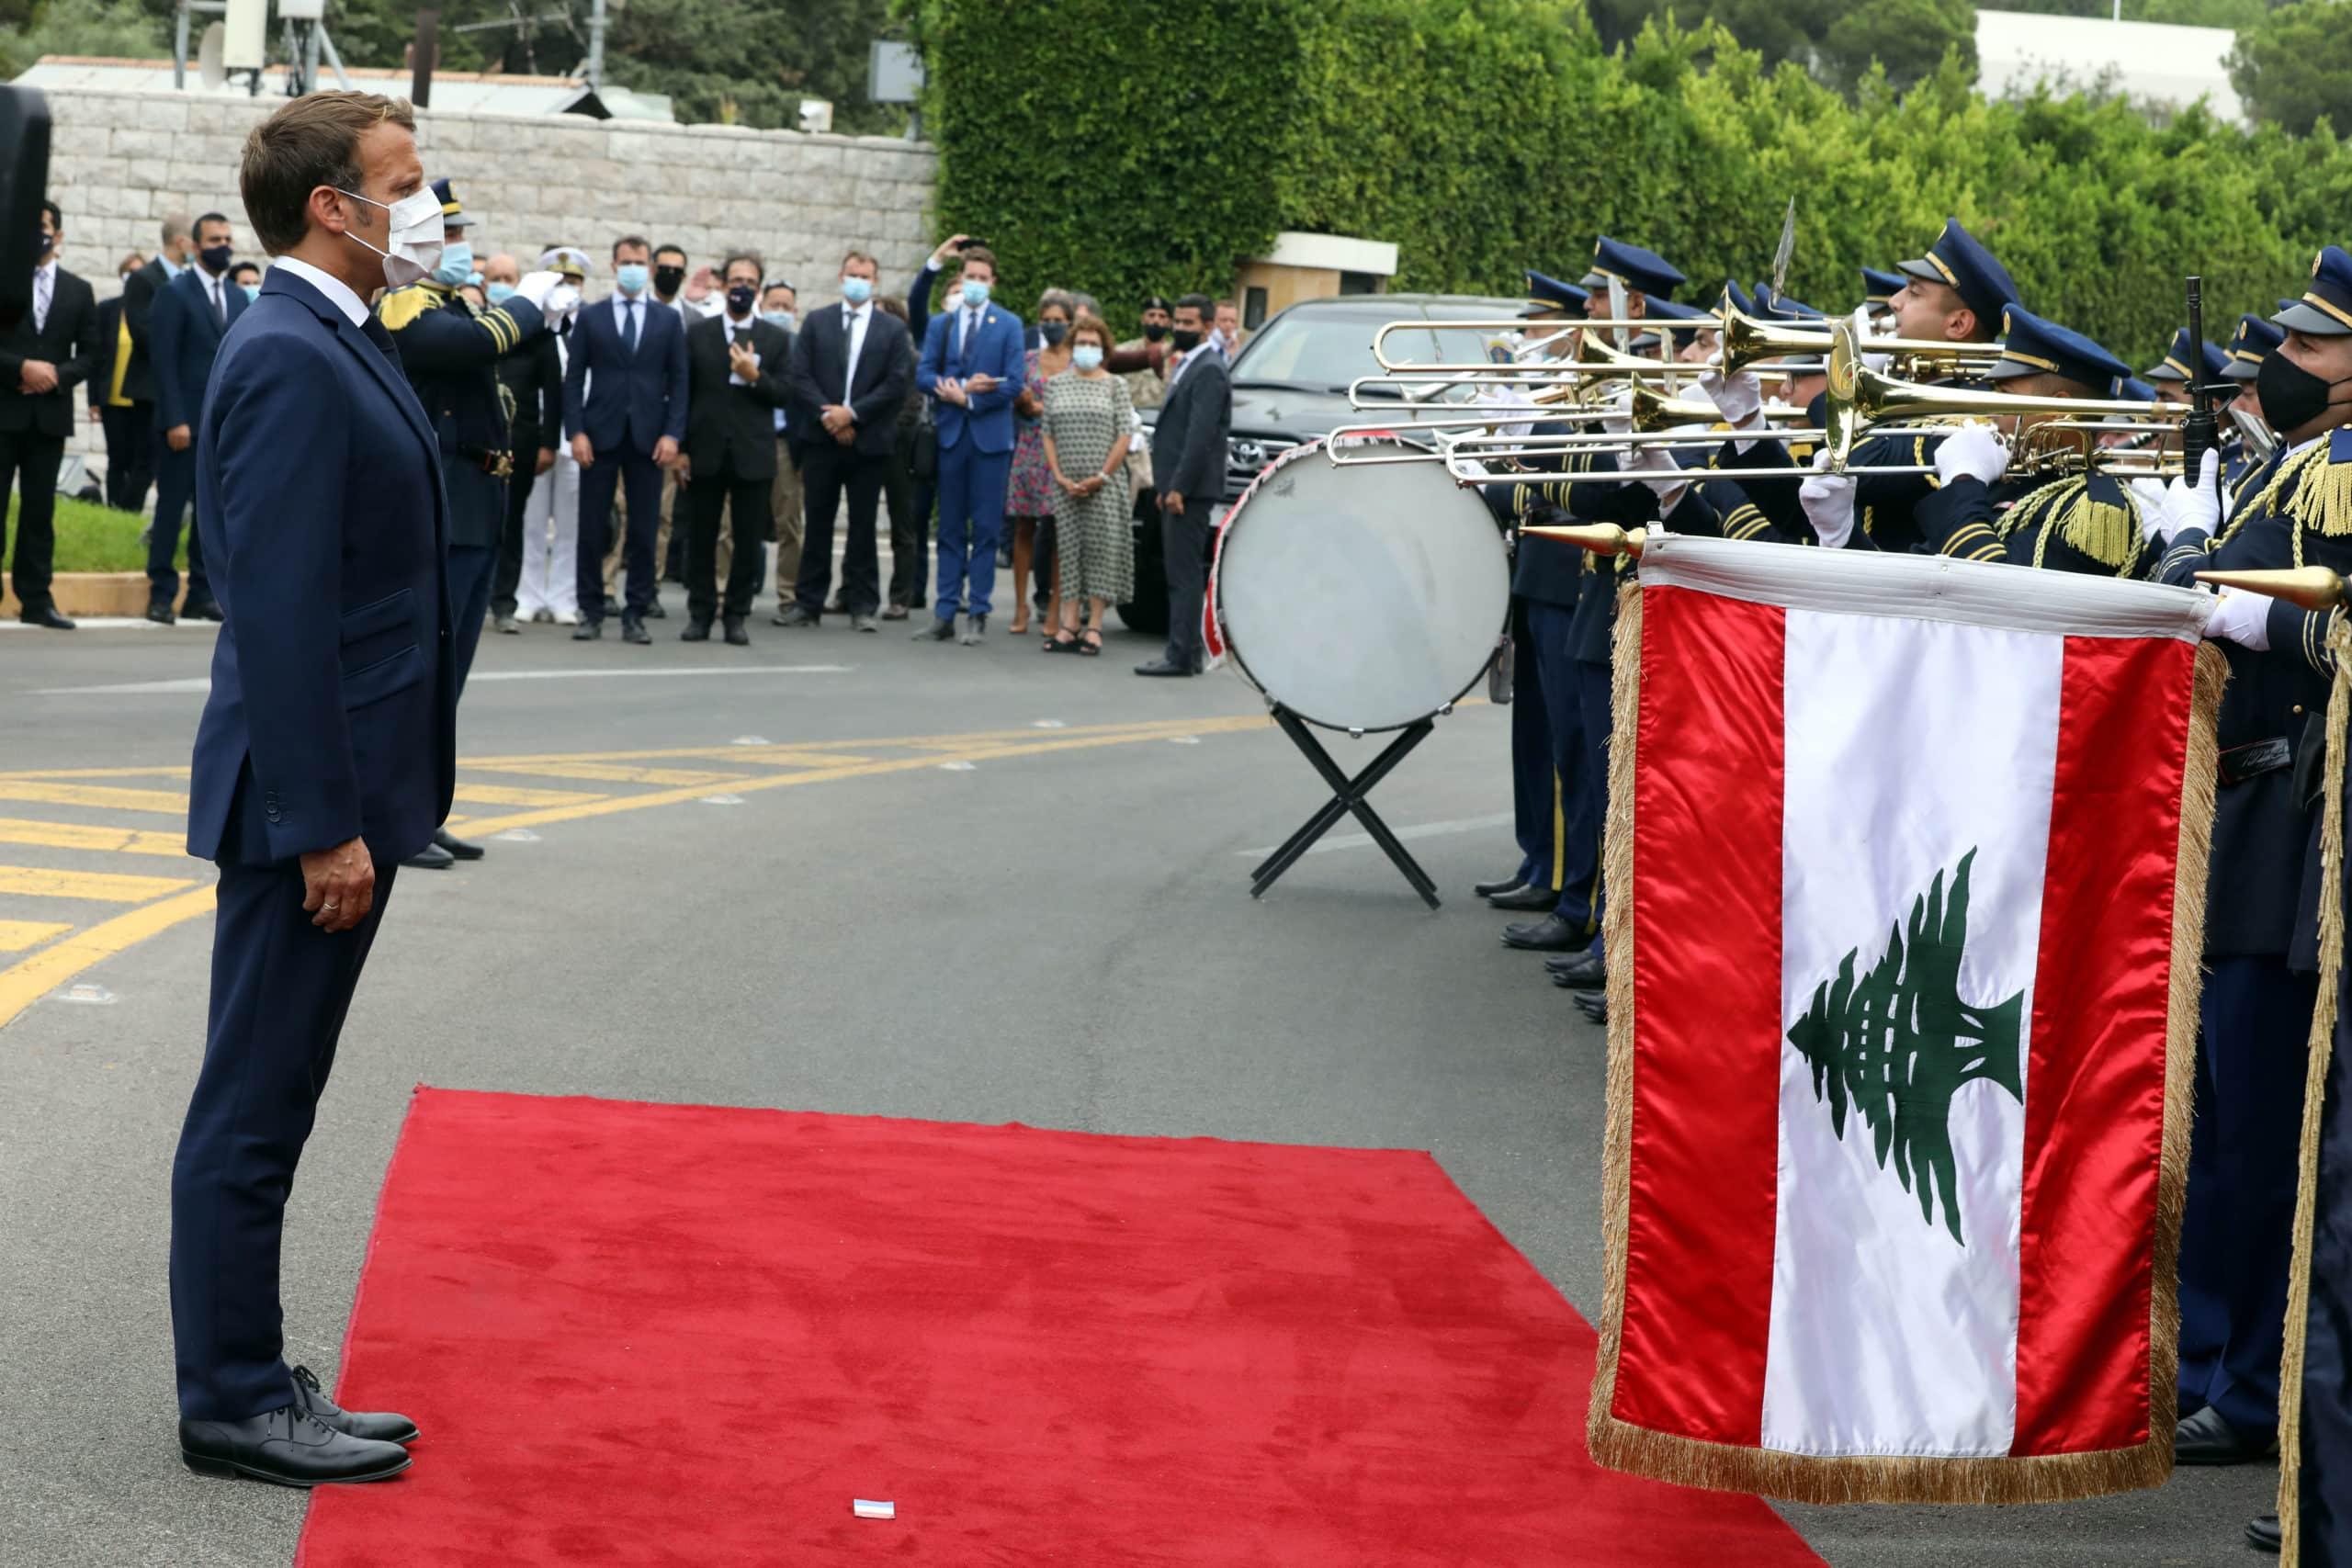 Dalati Aoun Macron 2 Scaled